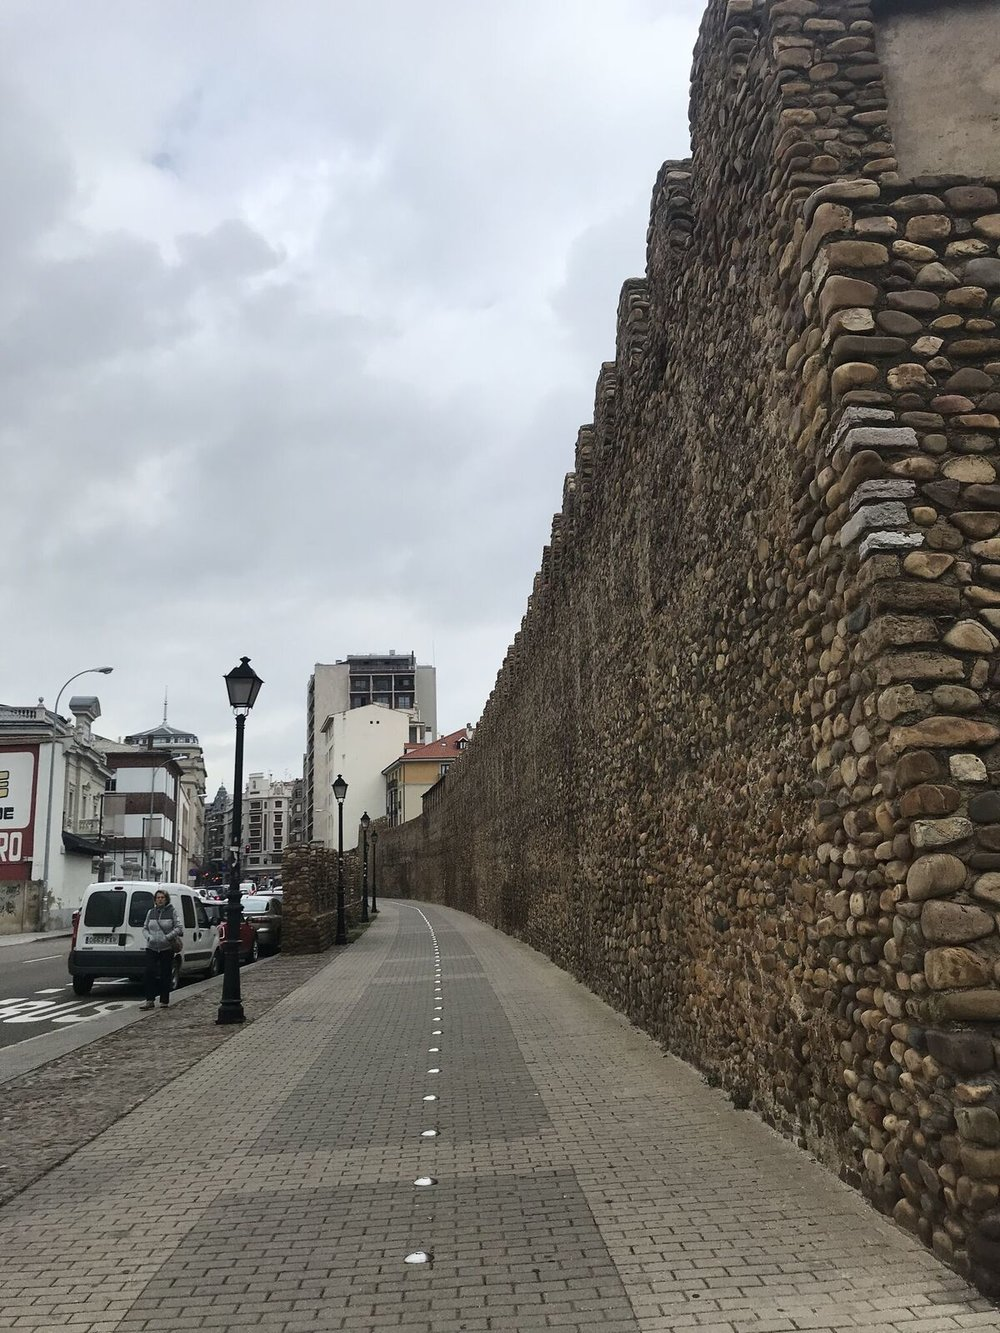 From Centro de Idiomas to city square